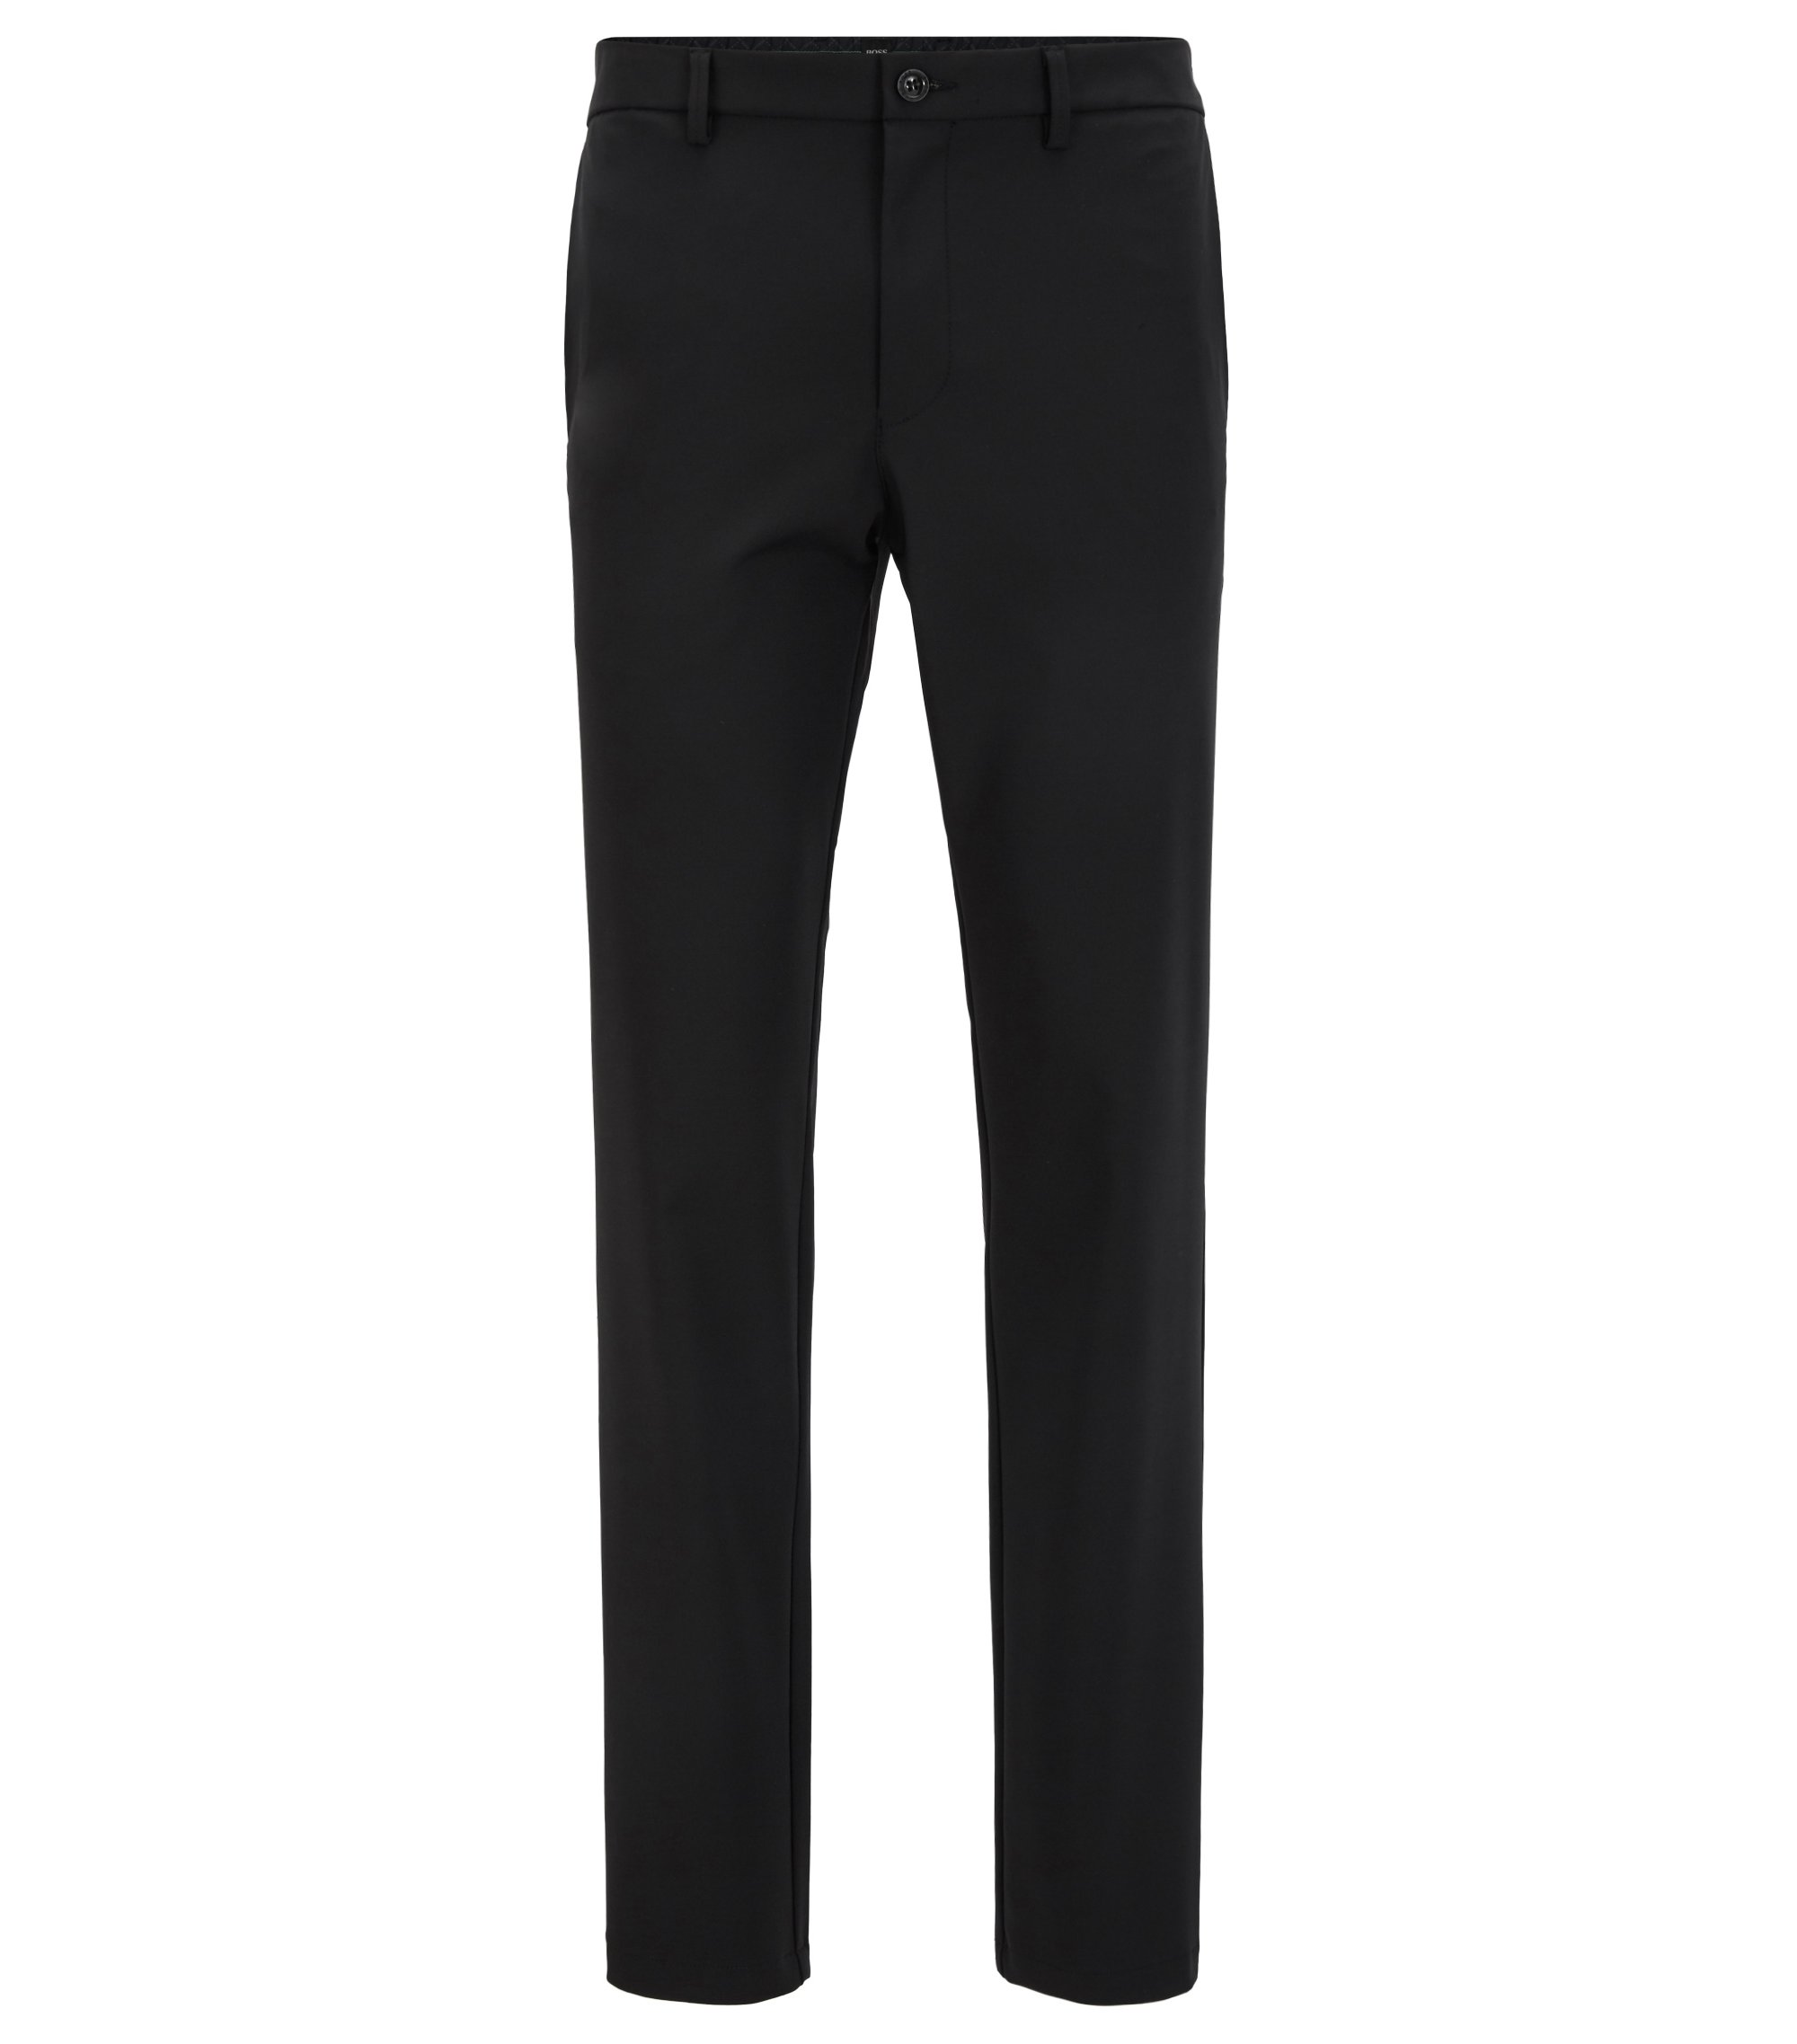 Anti-Wrinkle Pant, Slim Fit | Lavish, Black